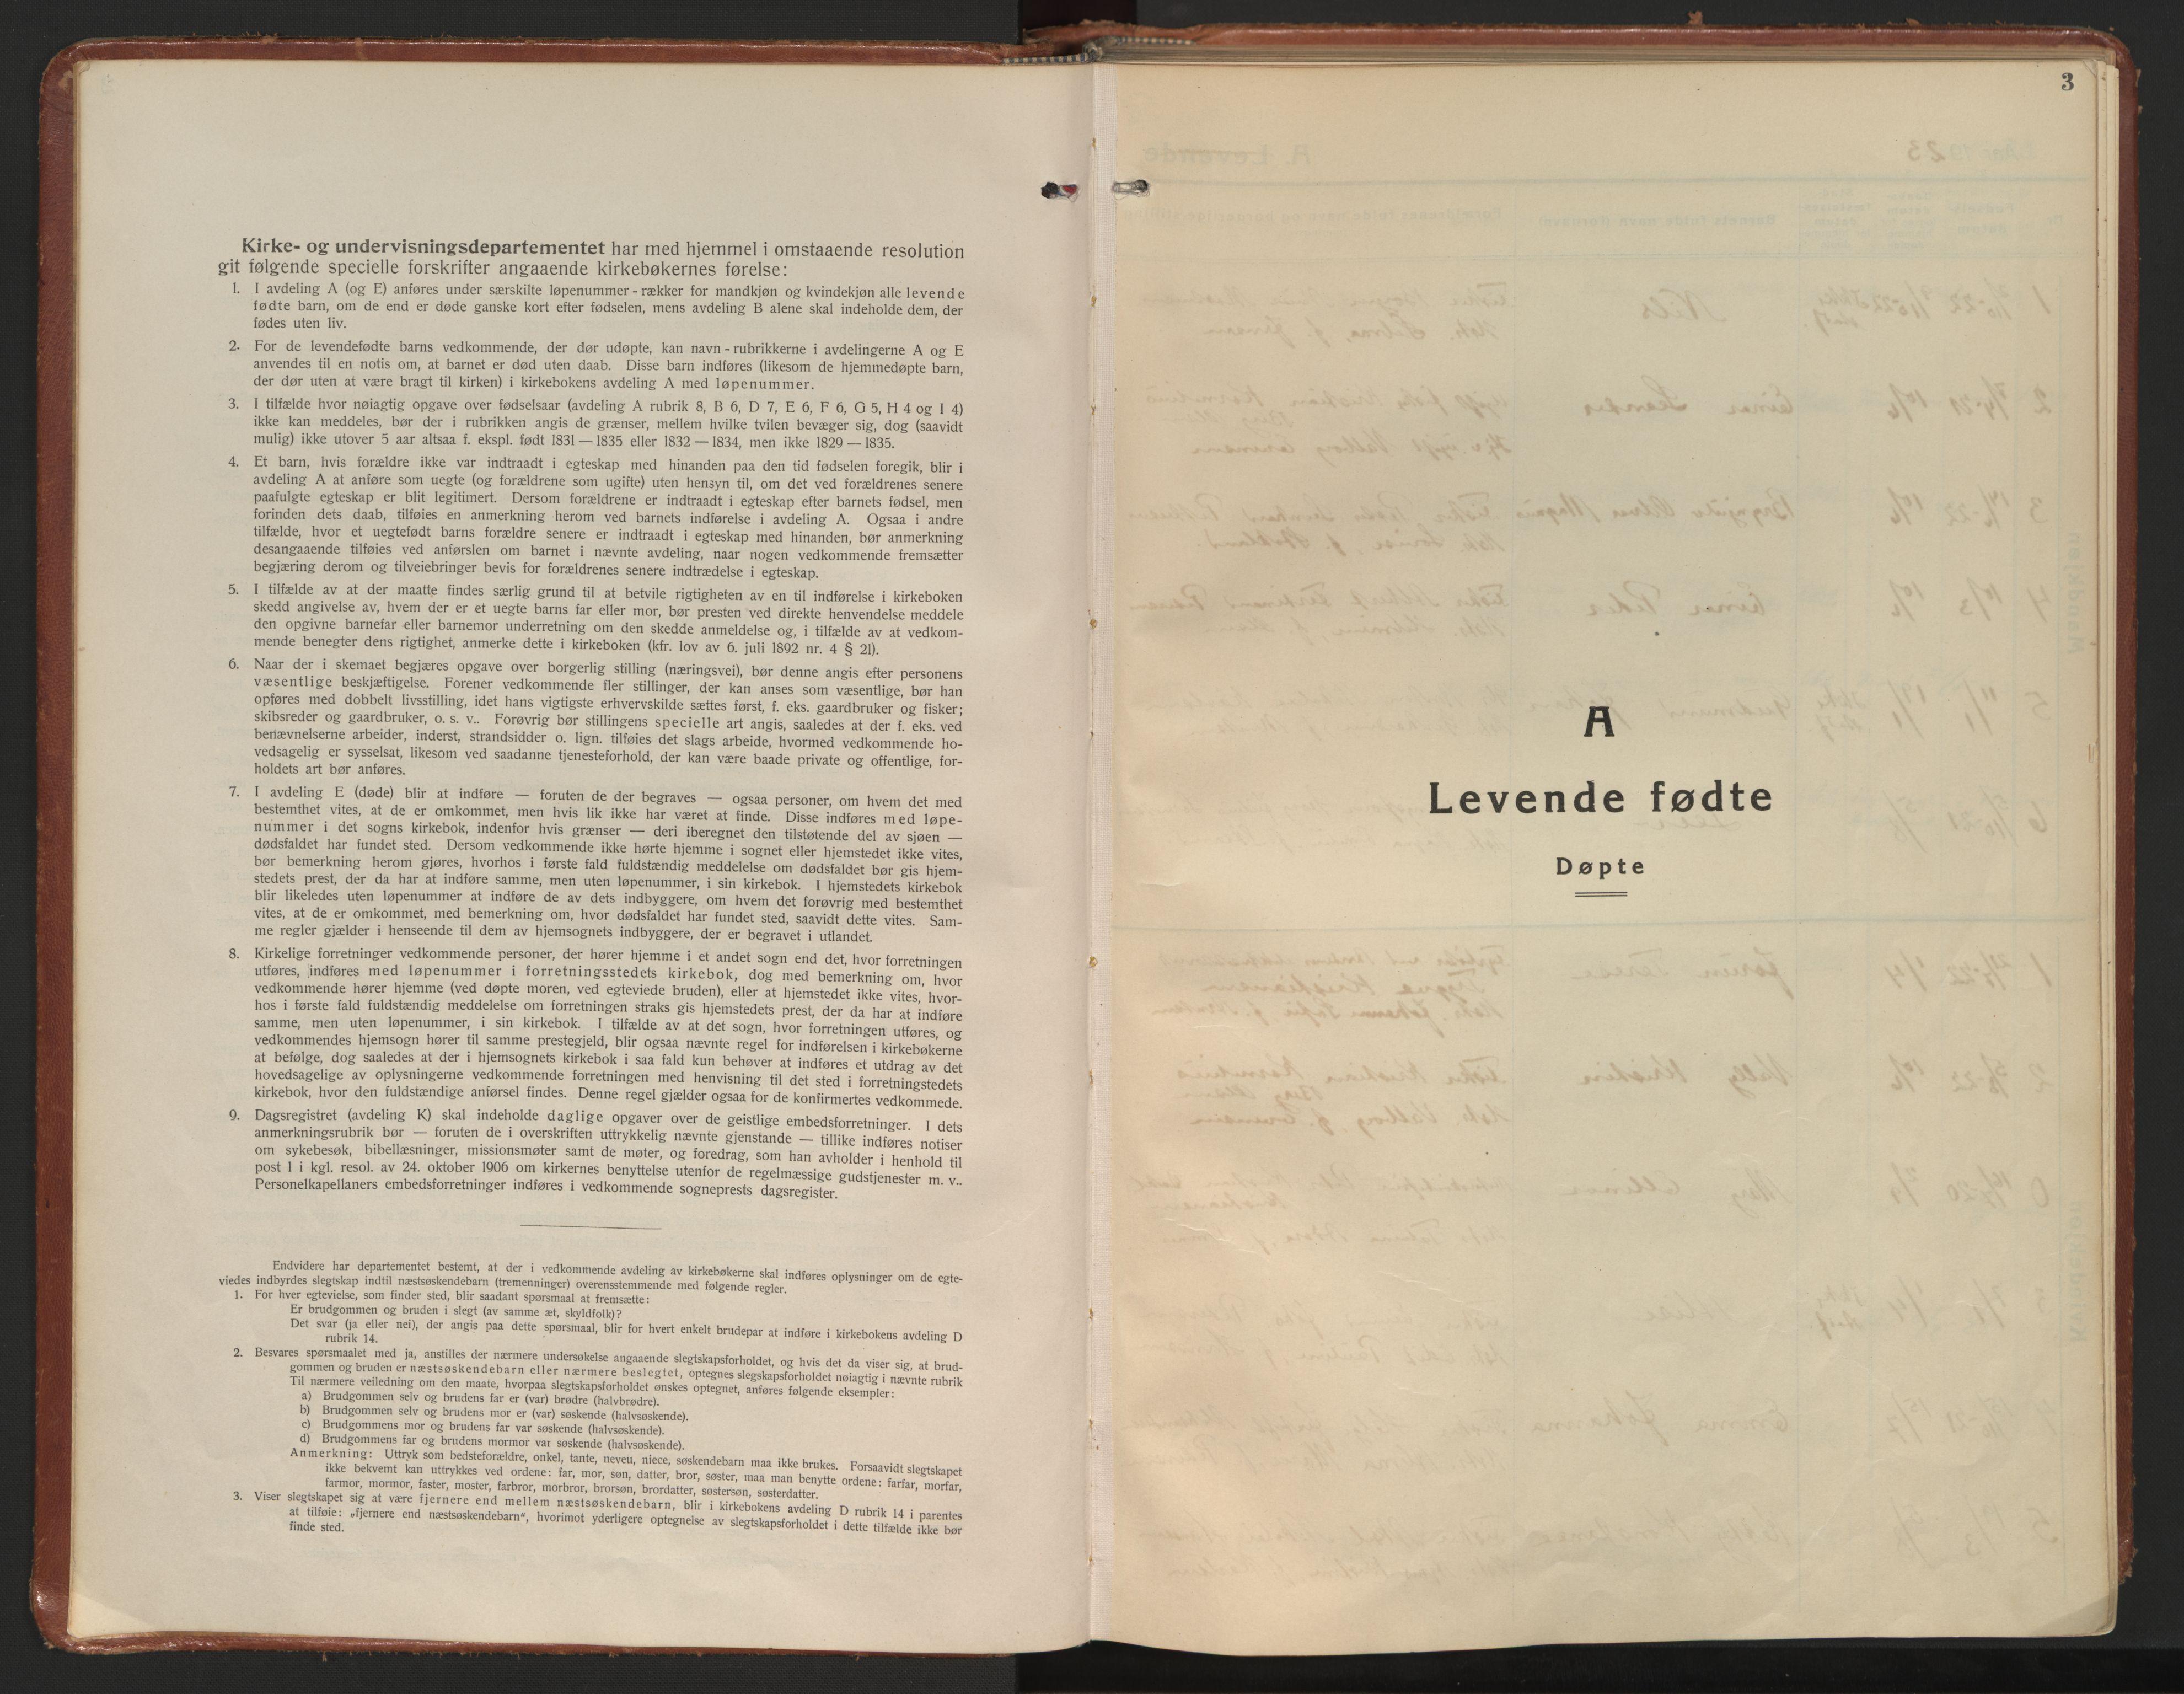 SAT, Ministerialprotokoller, klokkerbøker og fødselsregistre - Nordland, 899/L1441: Ministerialbok nr. 899A09, 1923-1939, s. 3